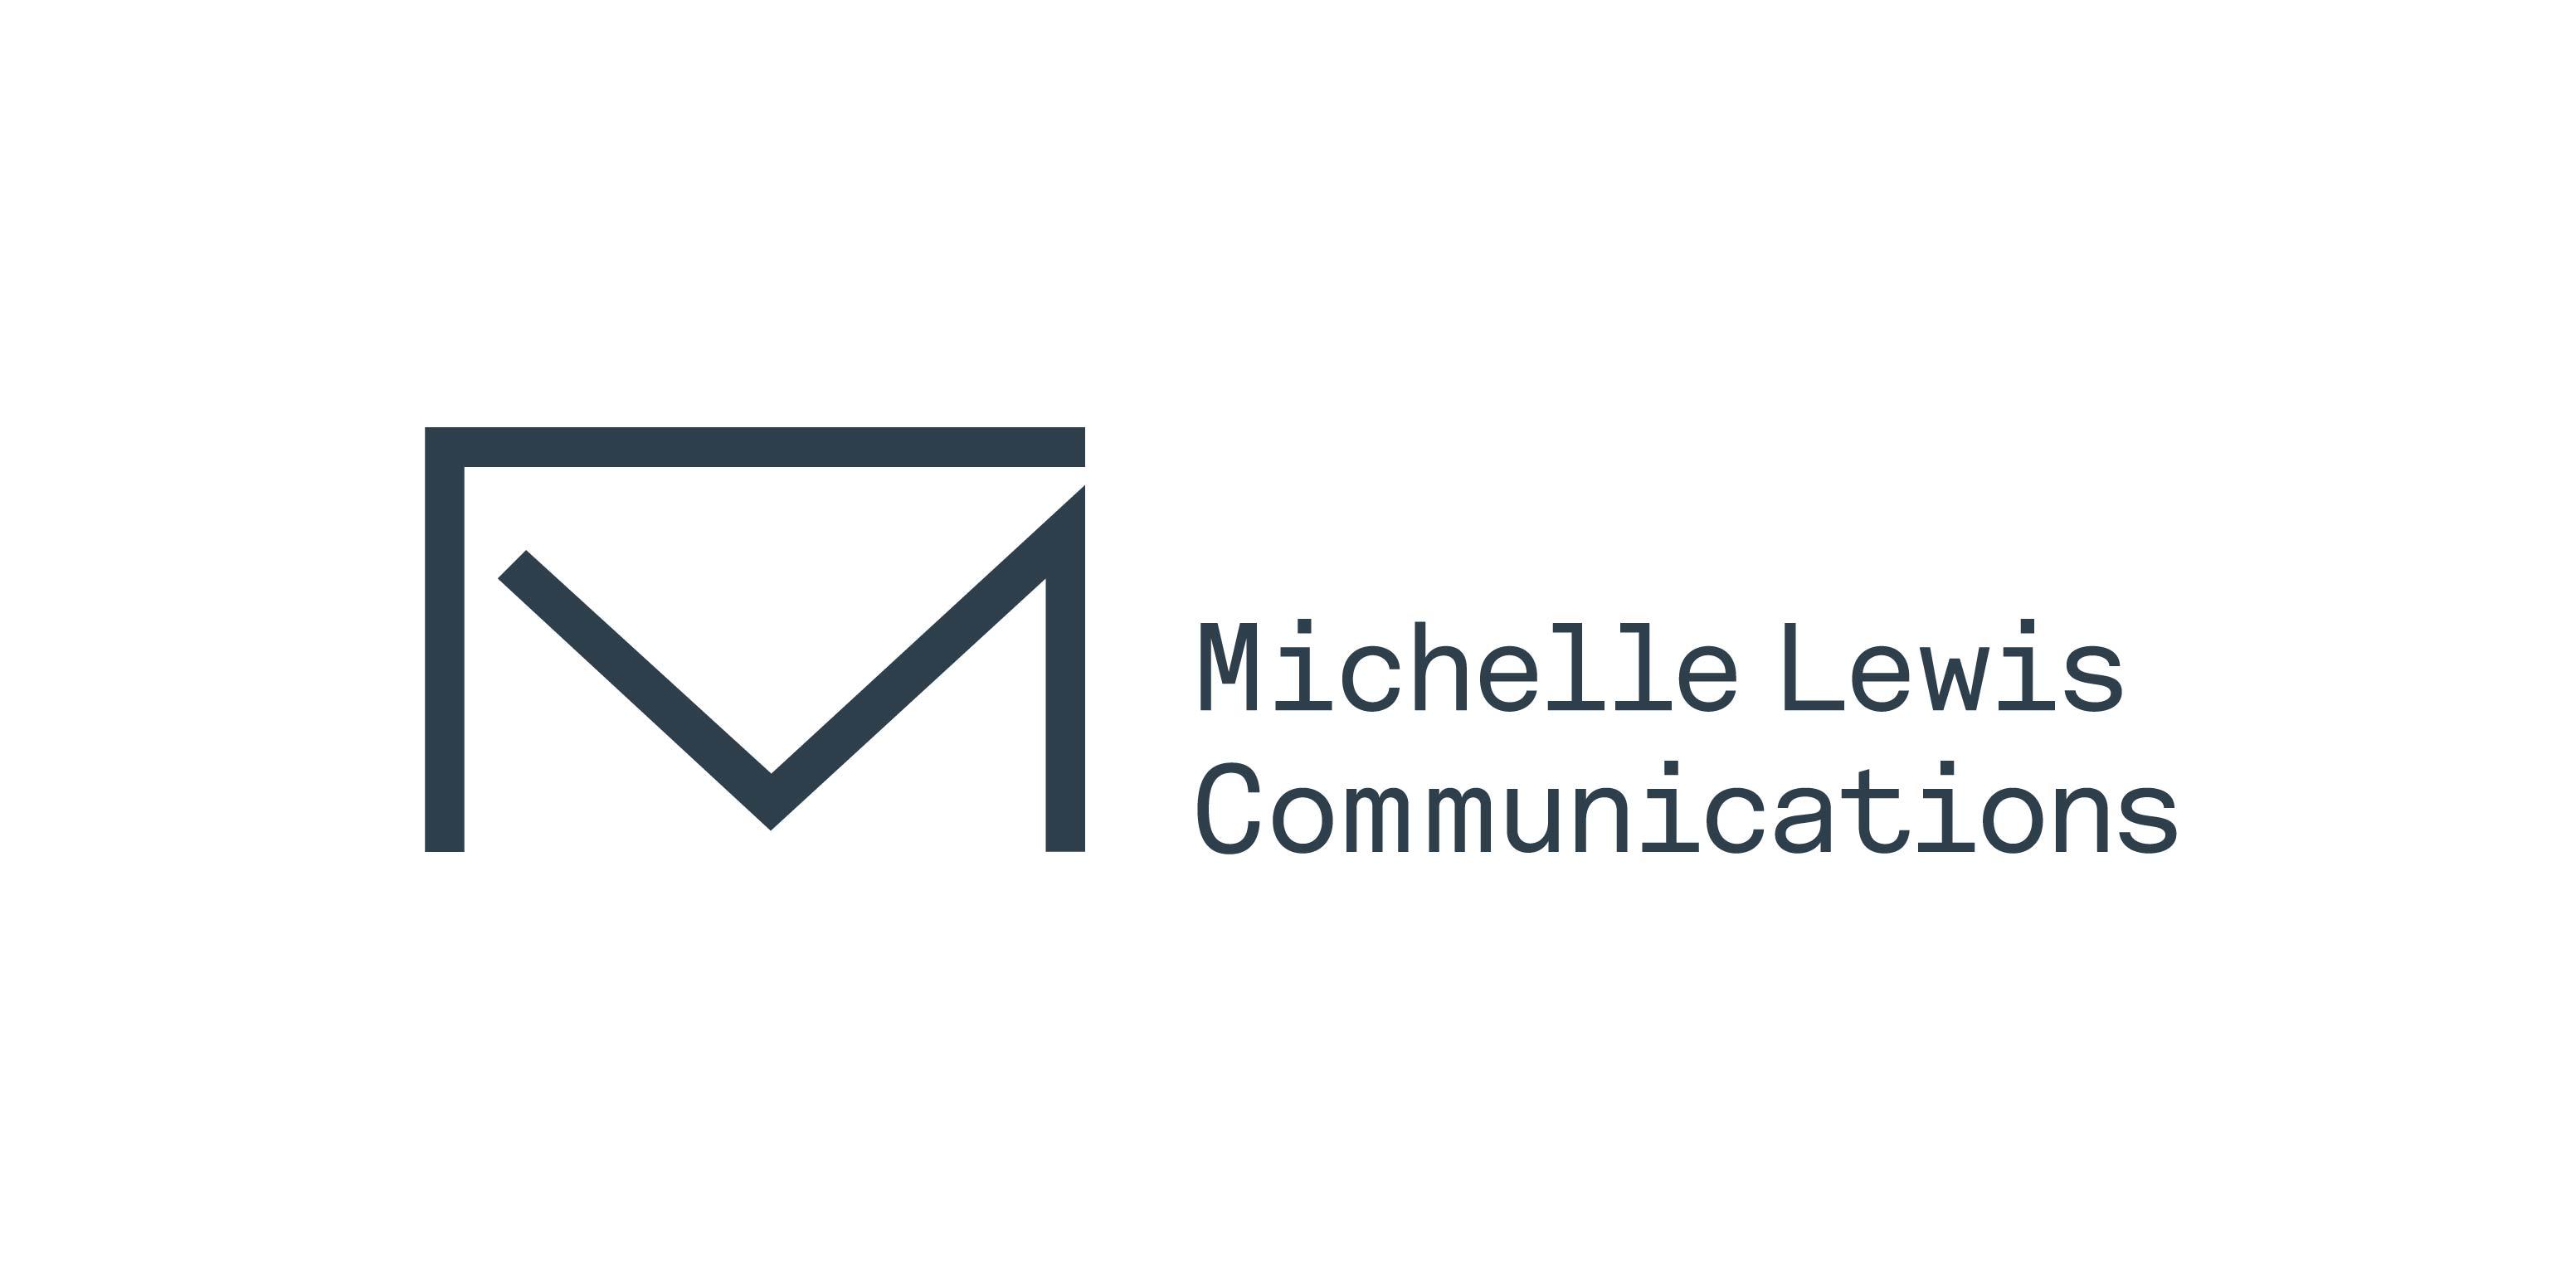 Michelle Lewis Communications